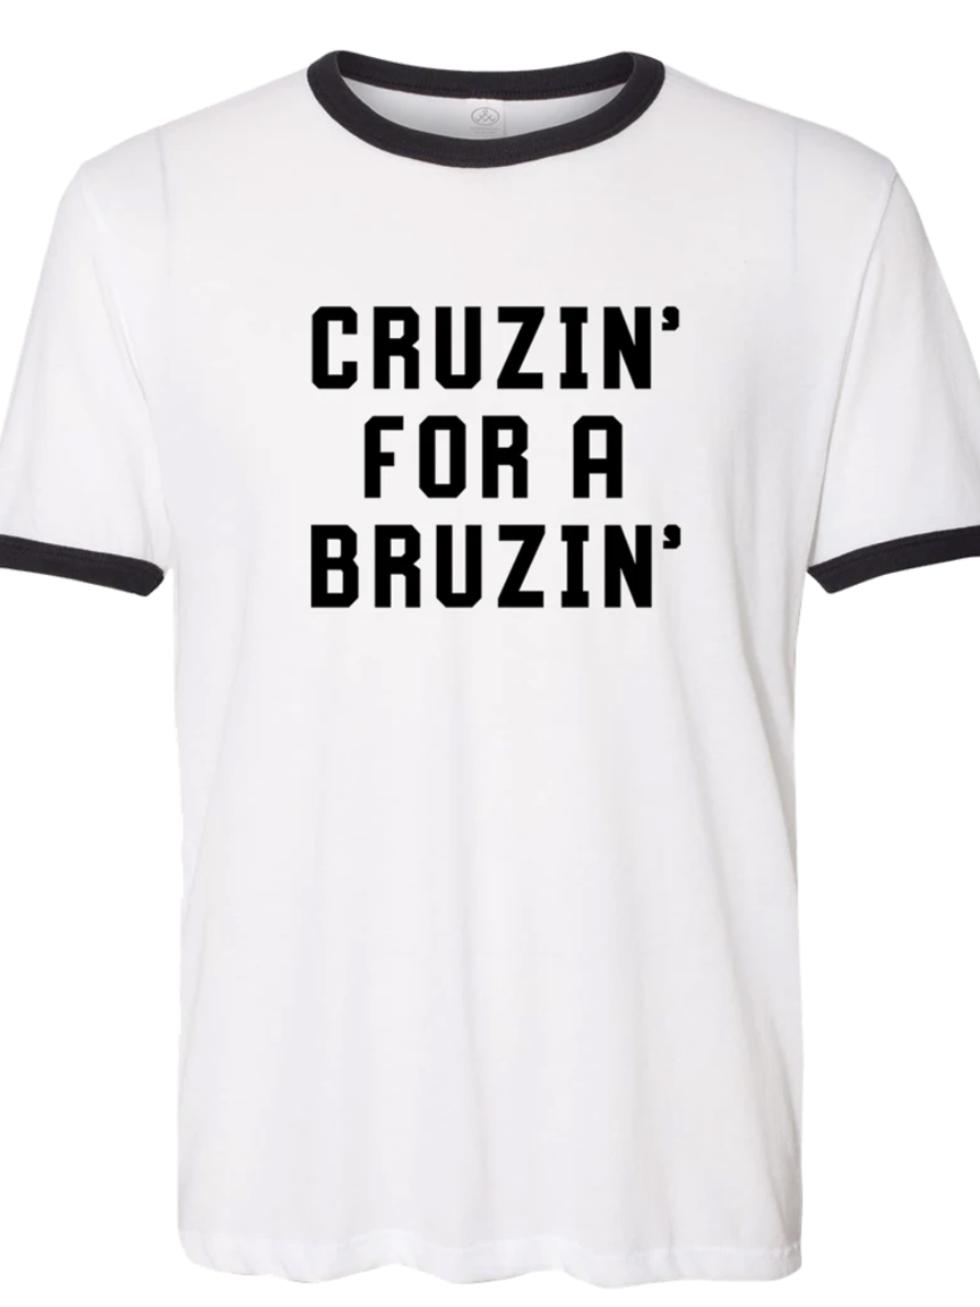 Cruzin for a Bruzin t-shirt